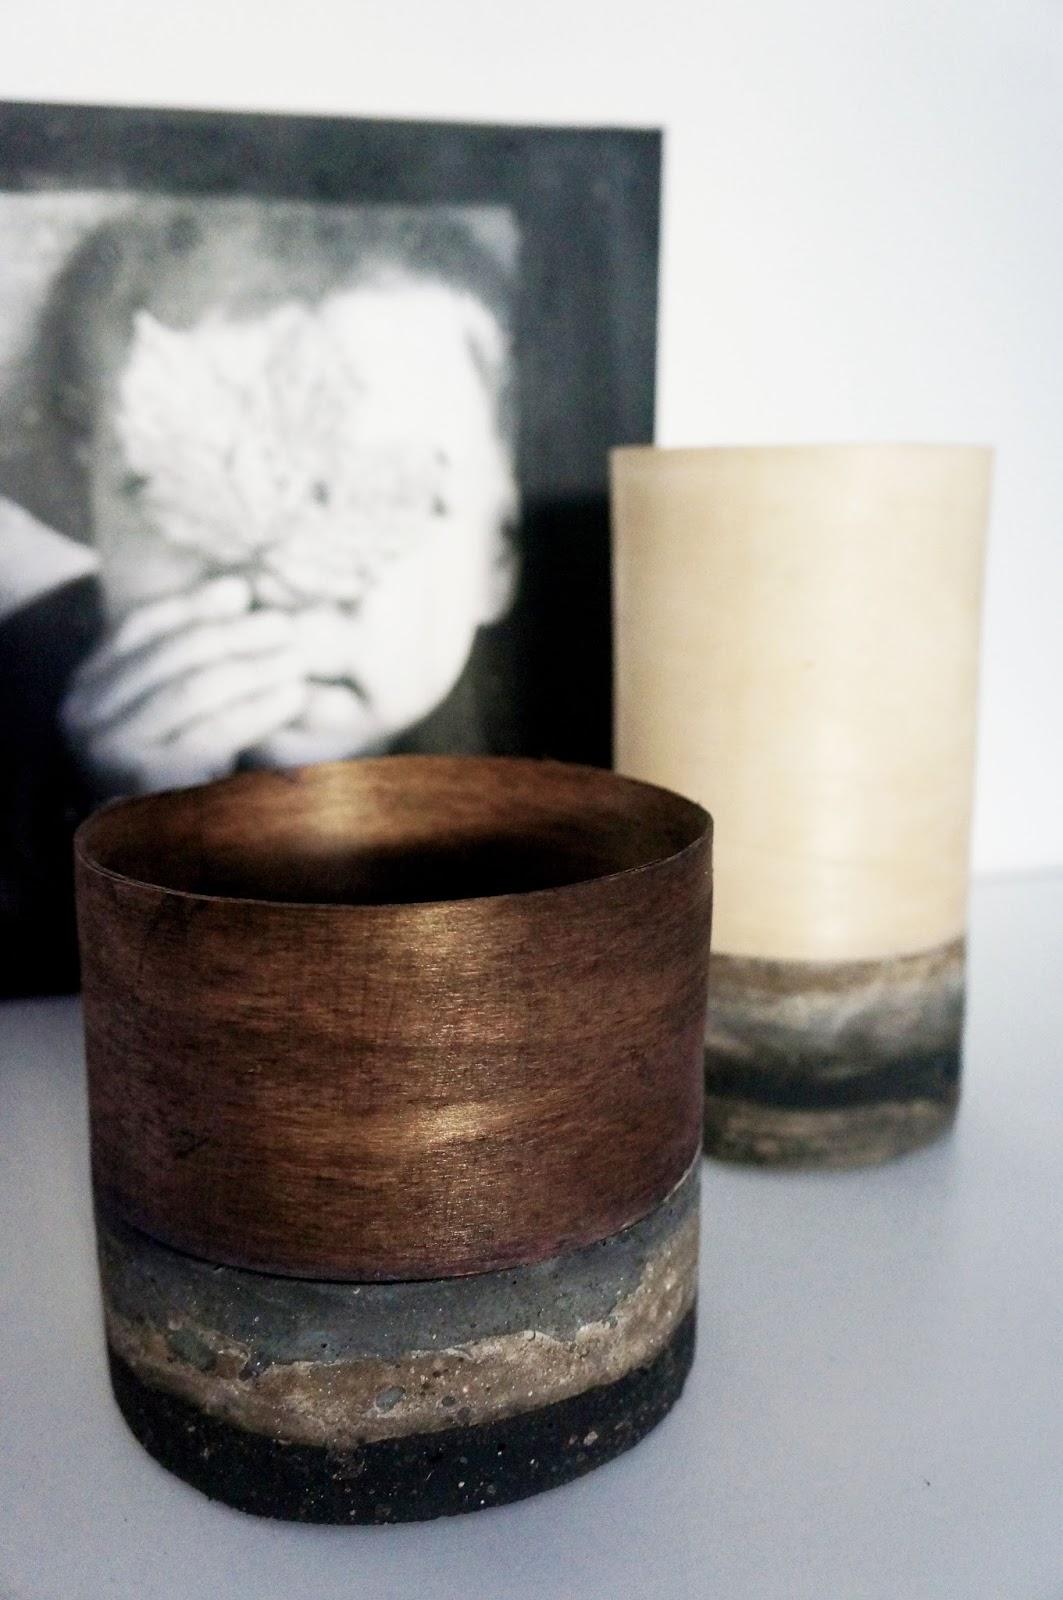 basteln malen Kuchen backen: Beton-Holzvasen